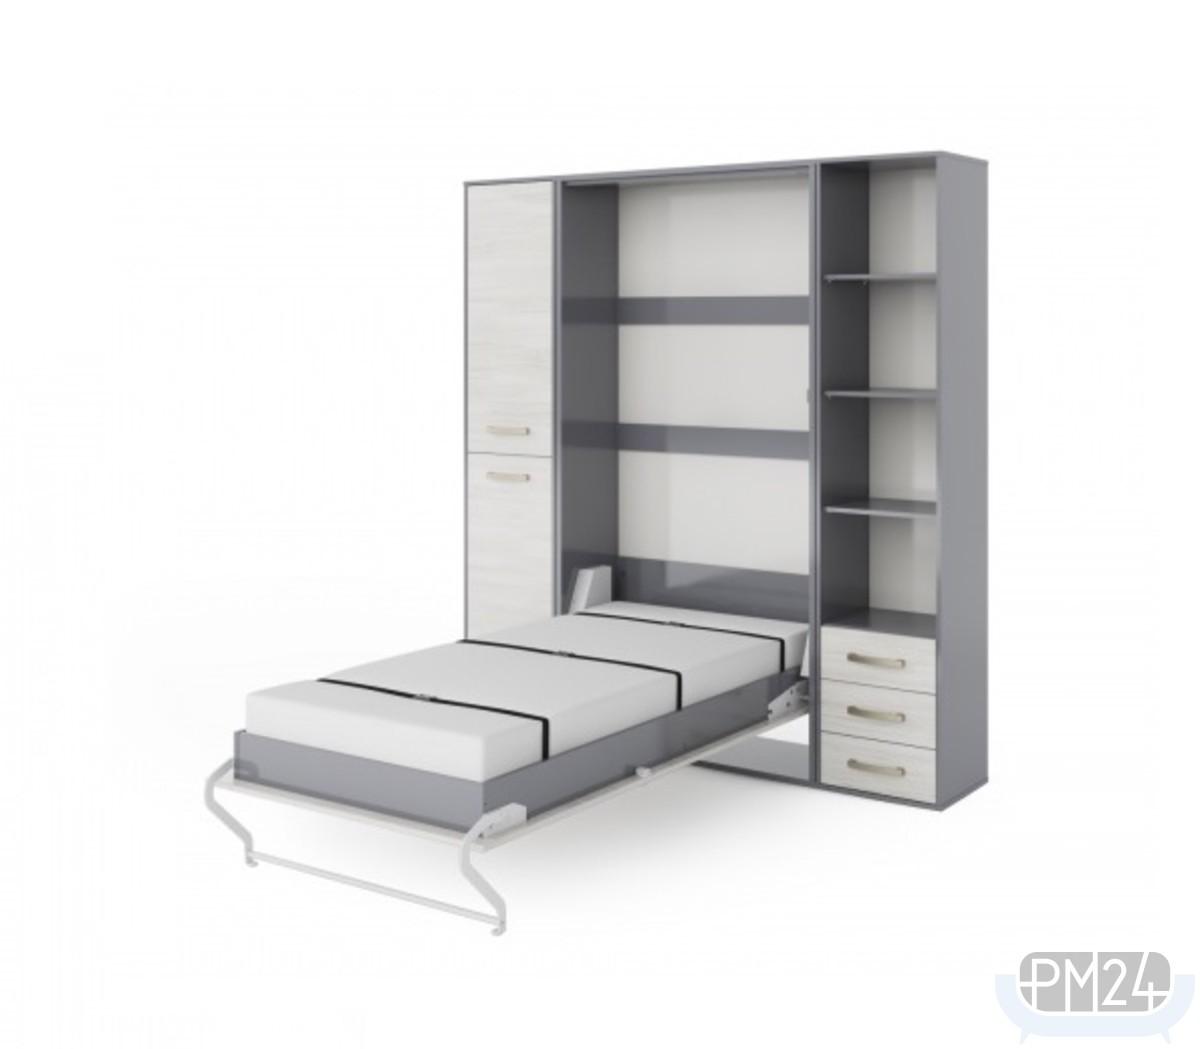 Kappvoodi Invento-03+09  90x200